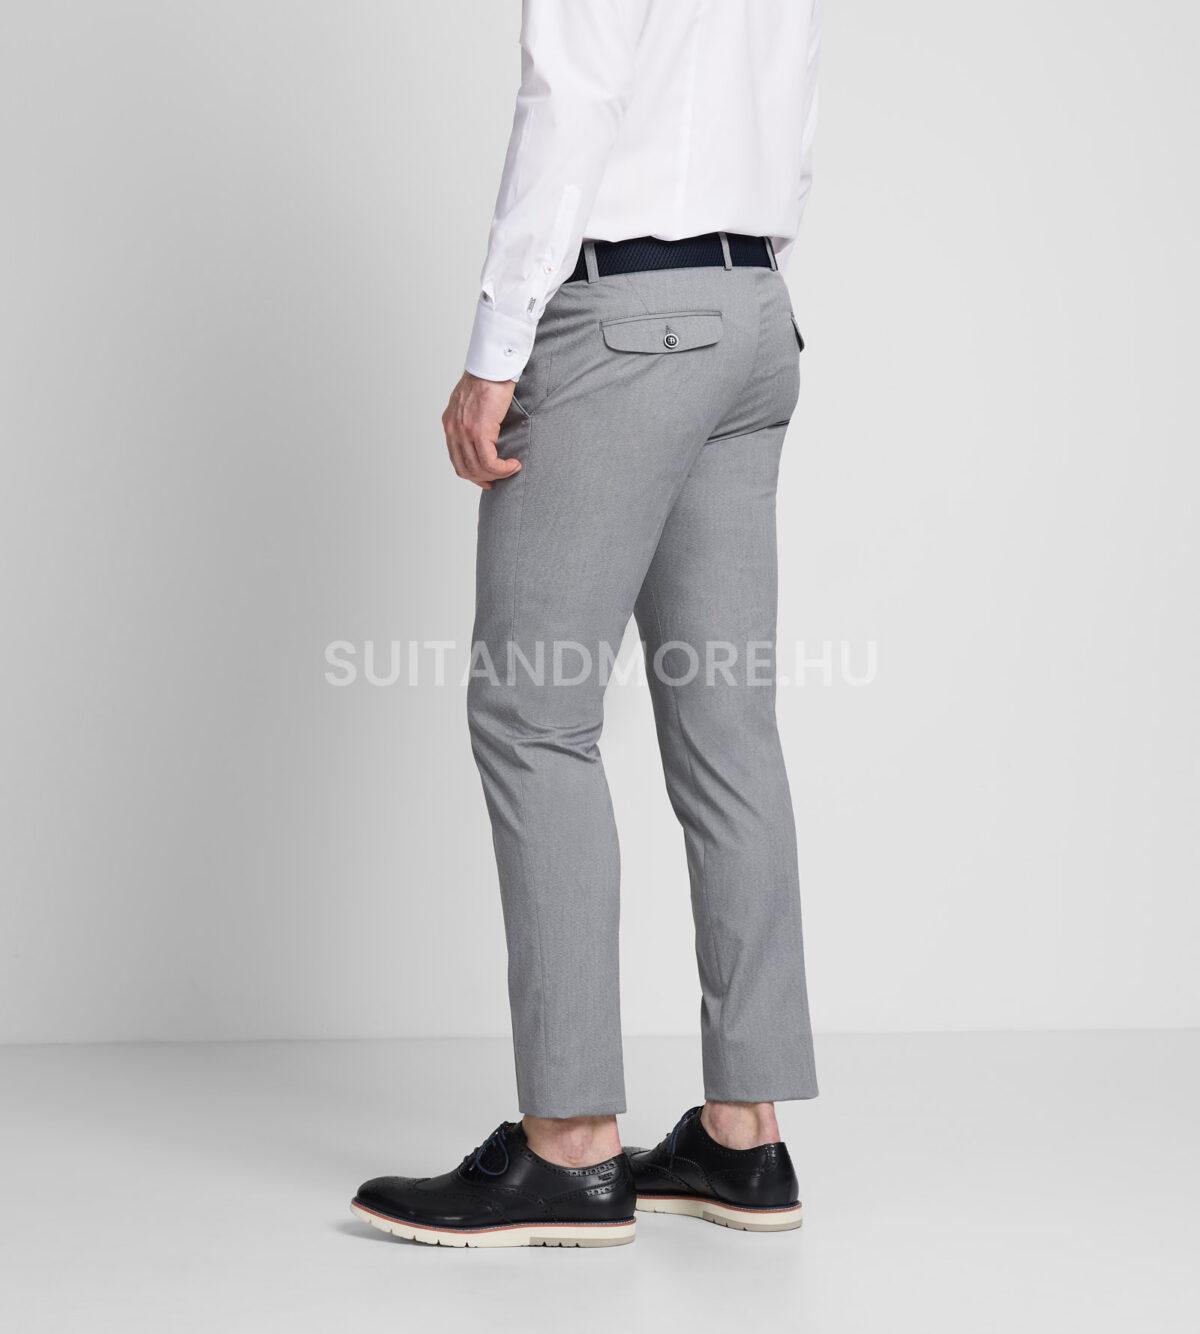 digel-move-szurke-extra-slim-fit-szovetnadrag-nico-1180180-46